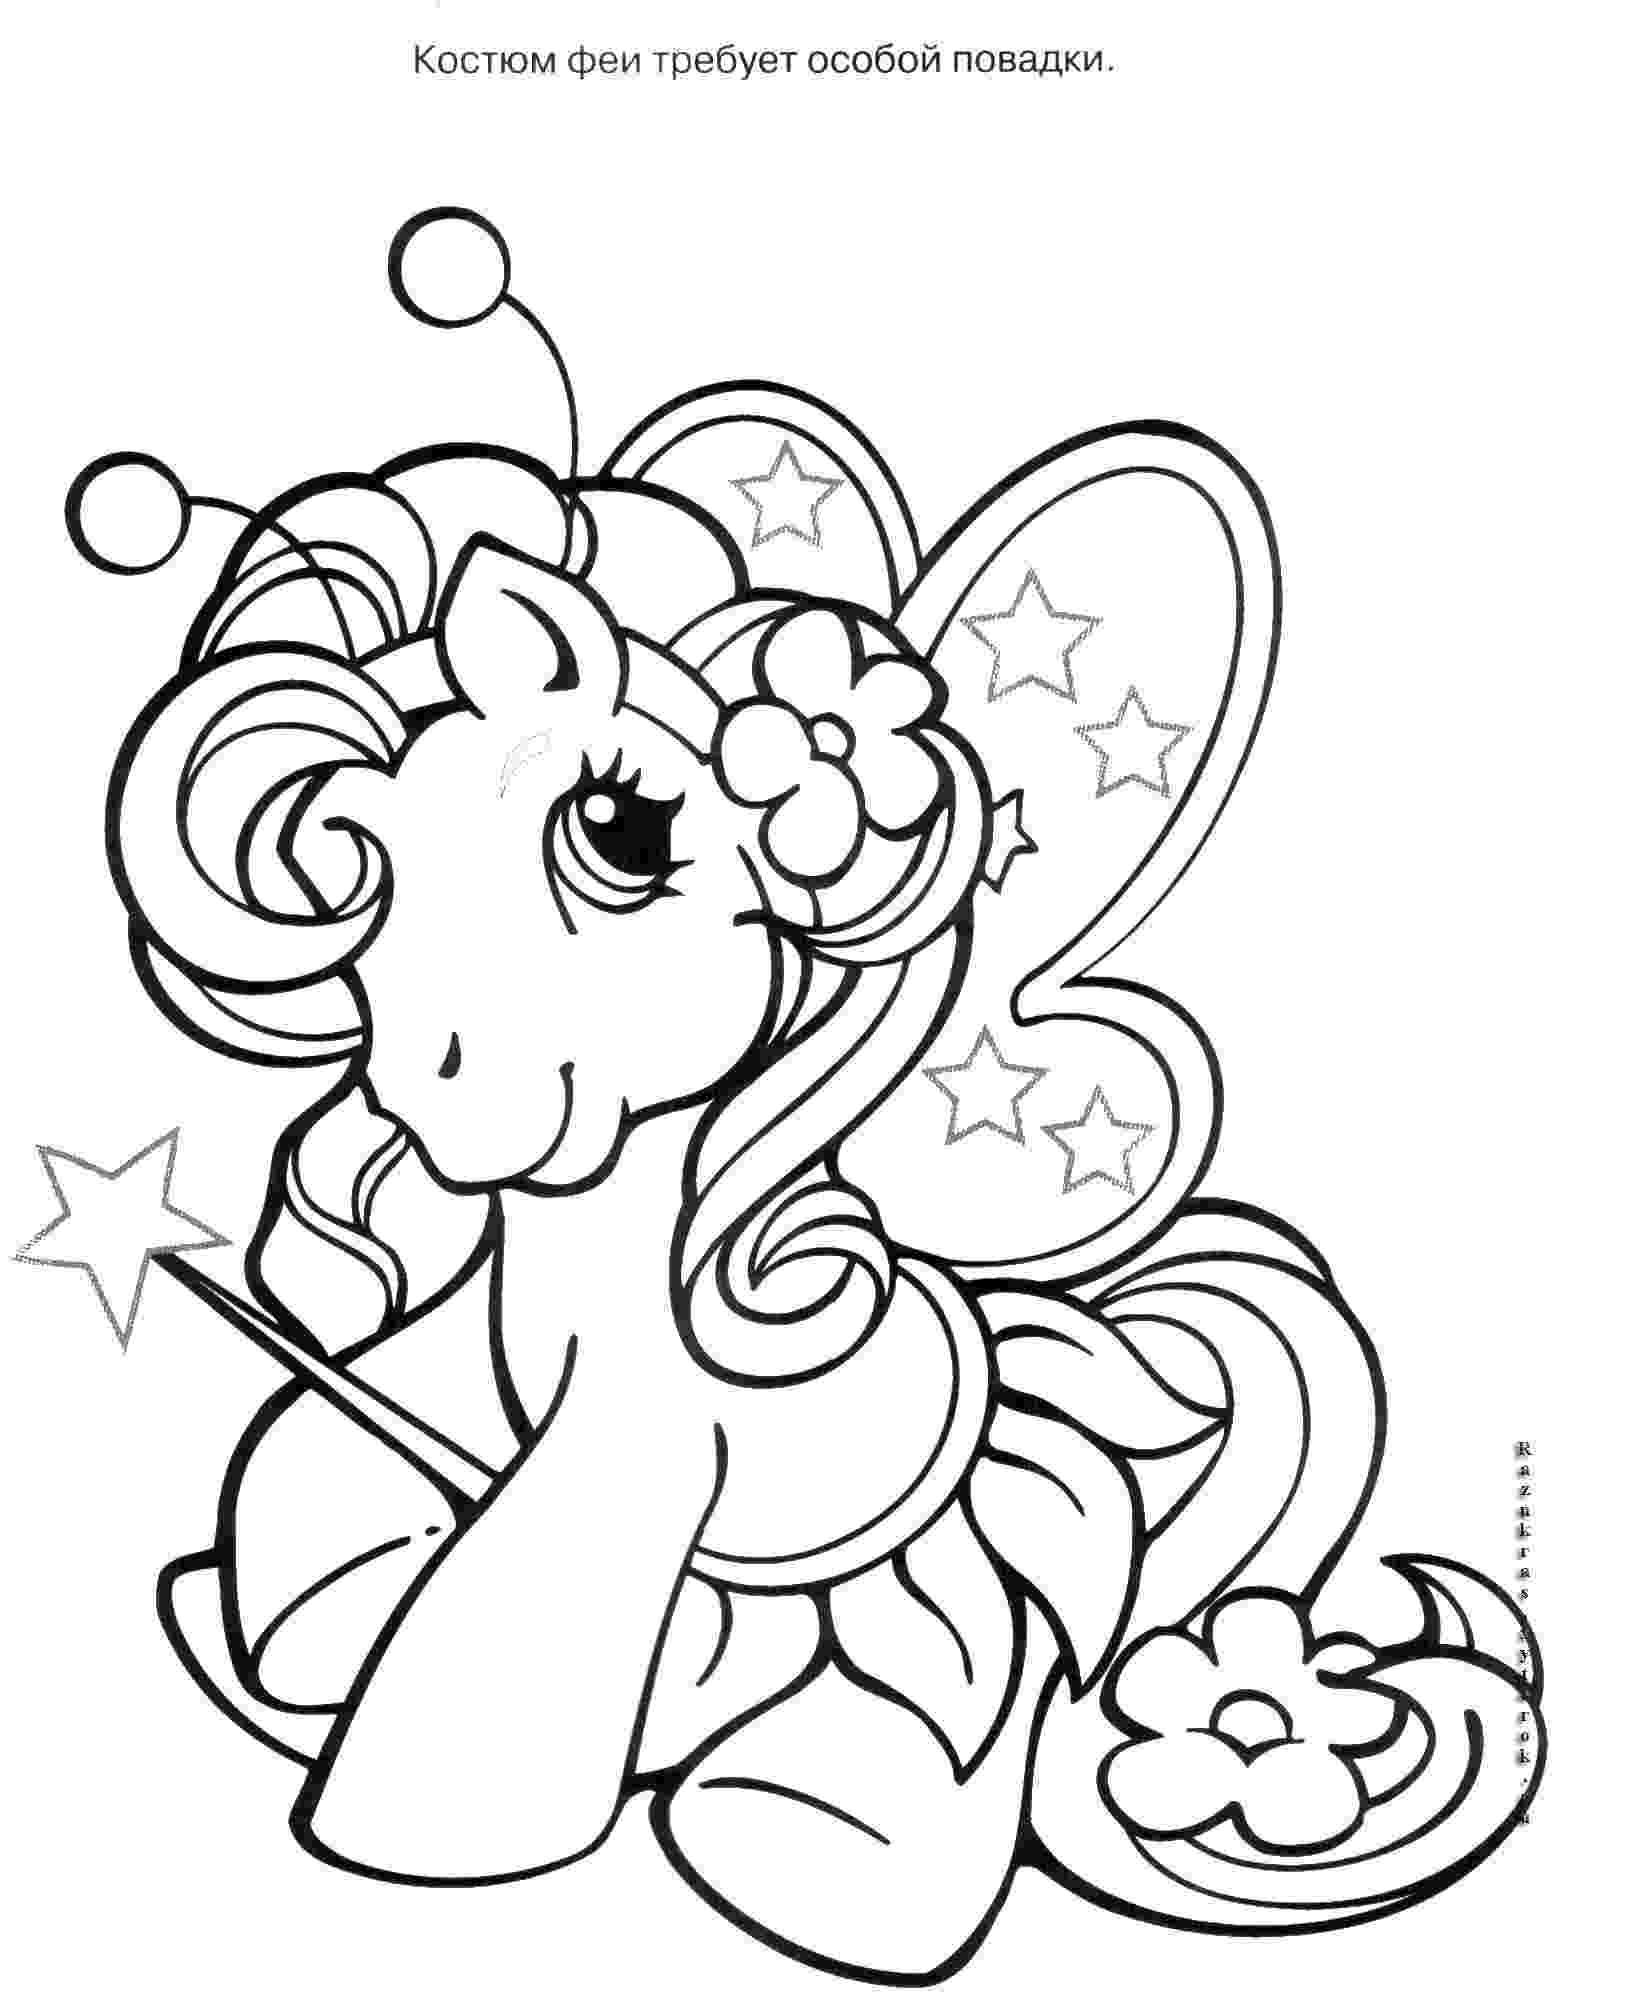 pony para colorear e imprimir mlp equestria girls coloring pages equestria girls imprimir e pony para colorear